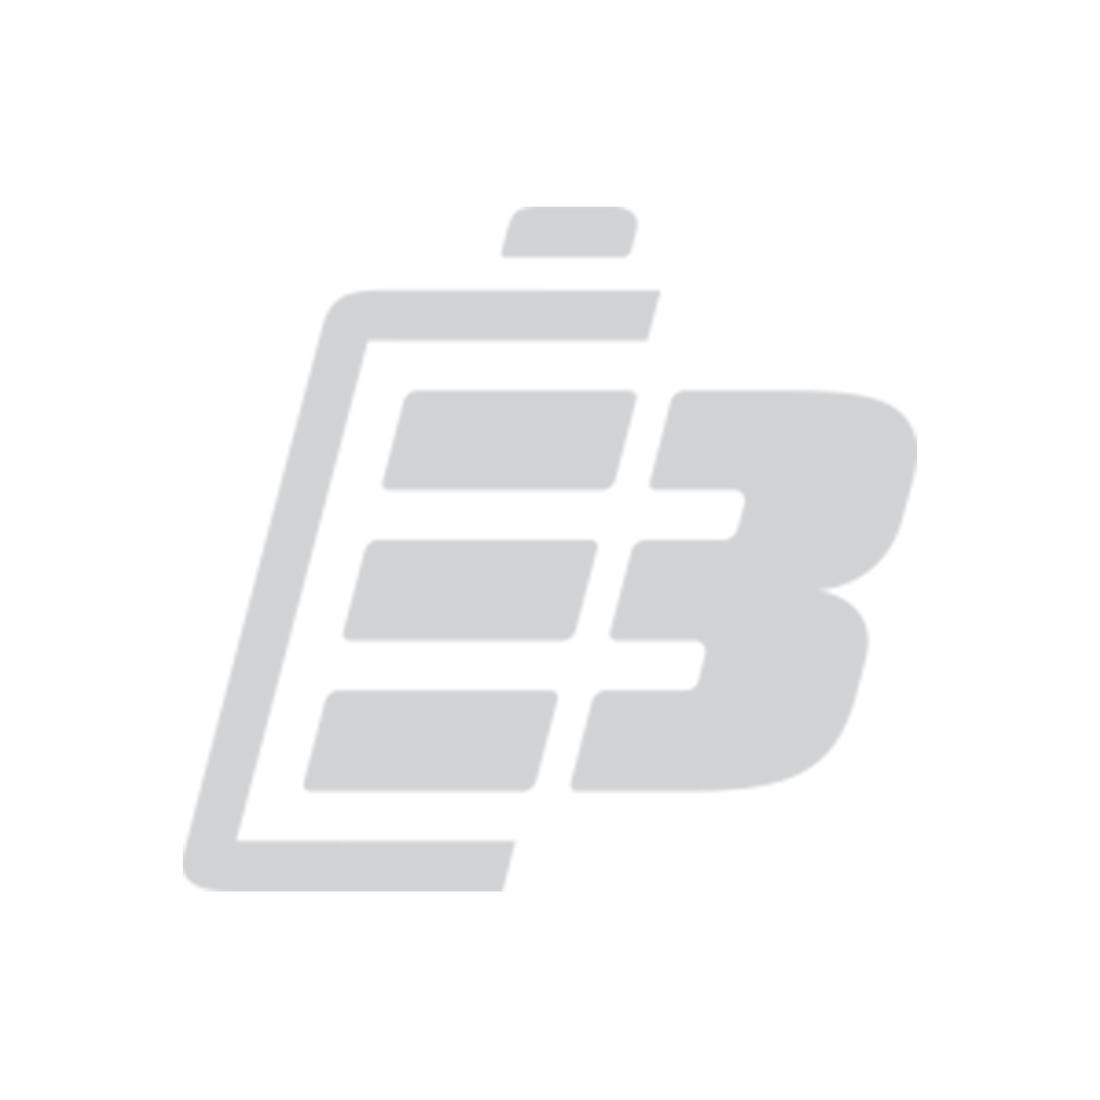 Power tool battery Makita 18V 4.0Ah_1